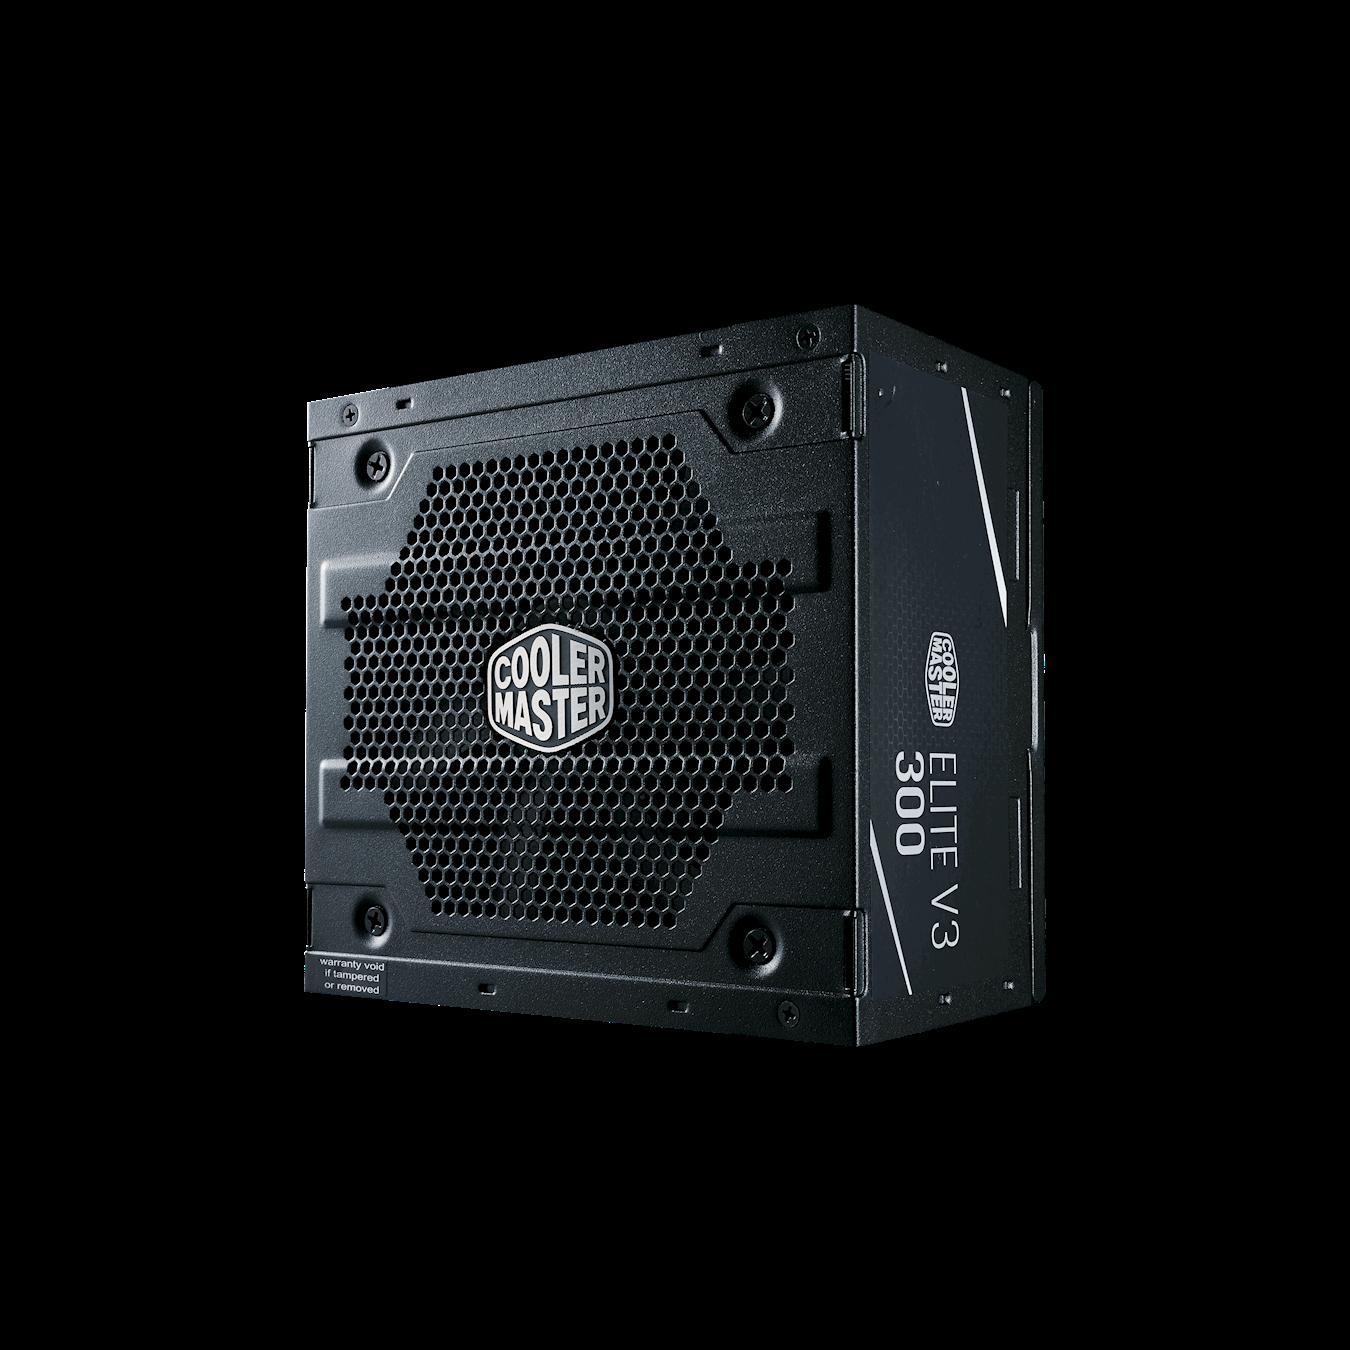 Cooler Master Power Supply Elite 300W 230V MPW-3001-ACABN1-UK